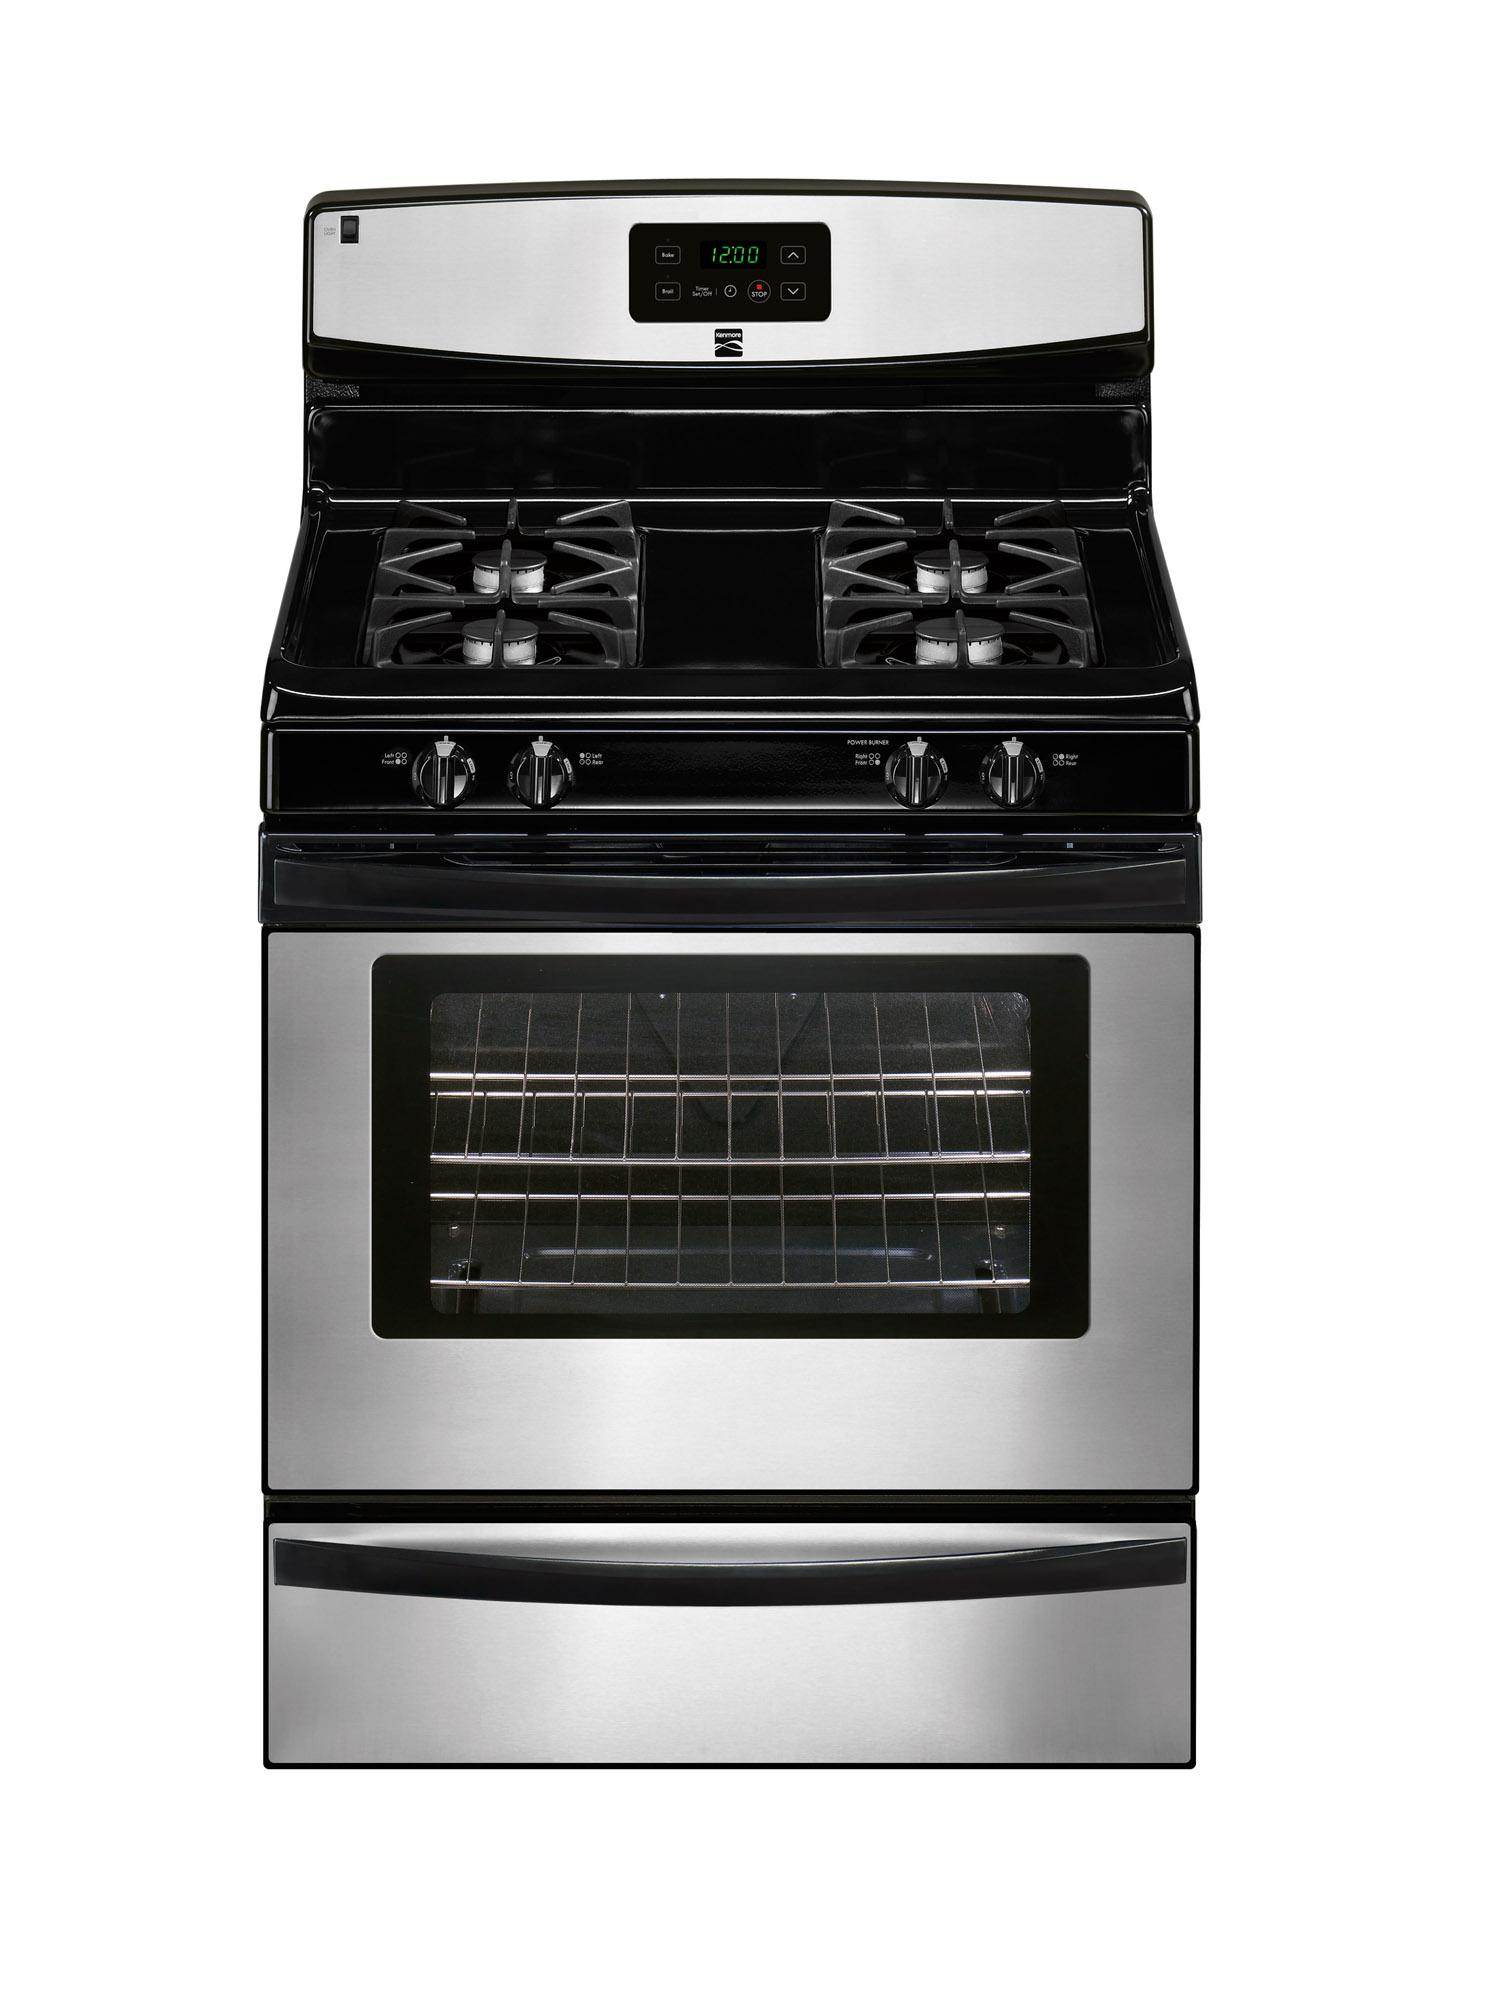 Kenmore Range/Stove/Oven Model 790.70503013 Parts